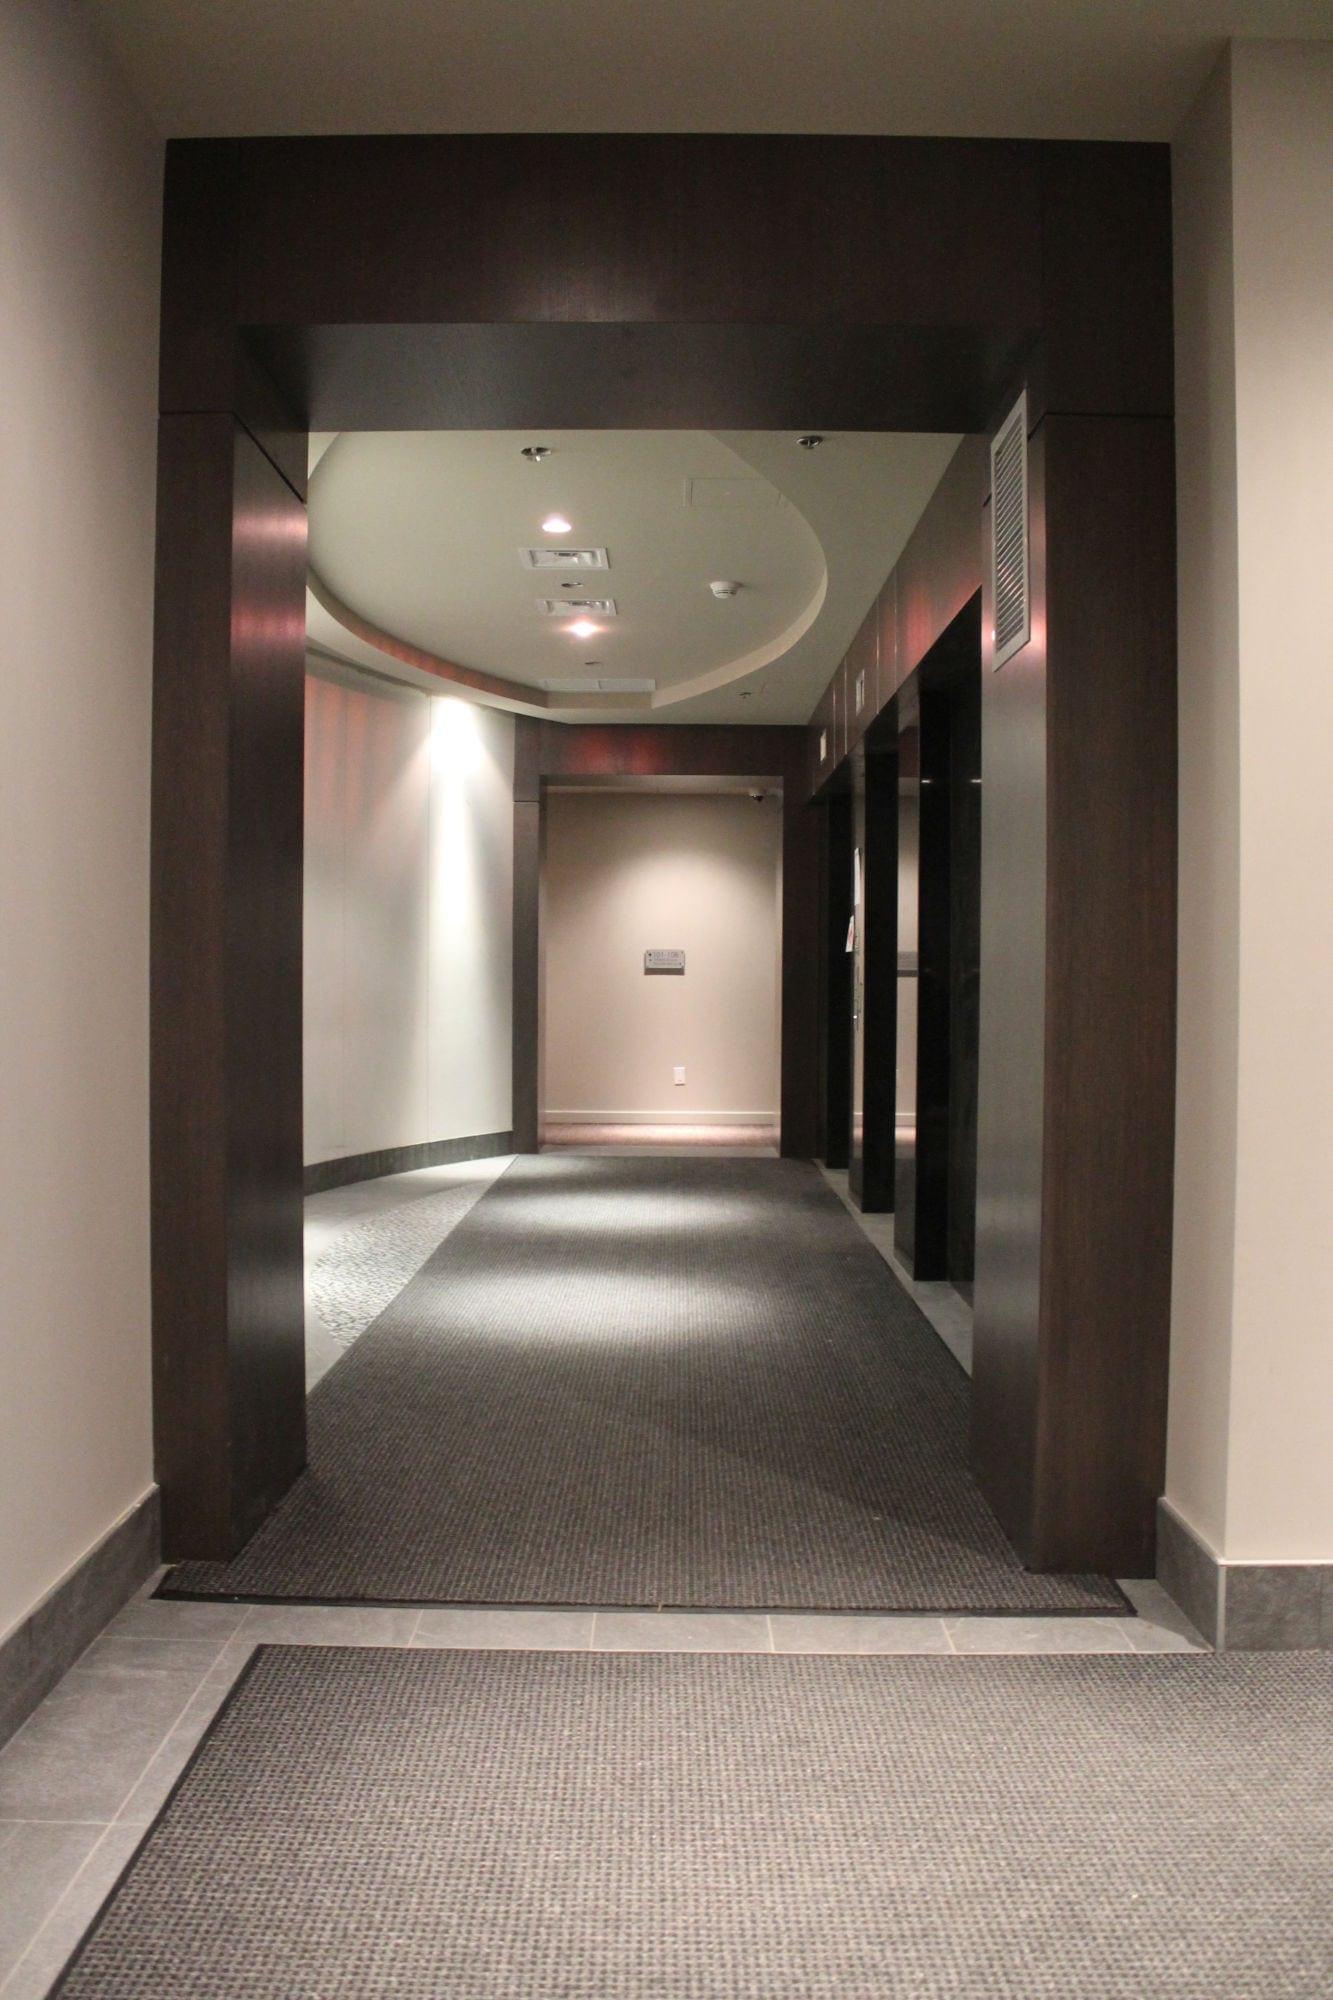 Interior view of entrance matting at Patricia Avenue